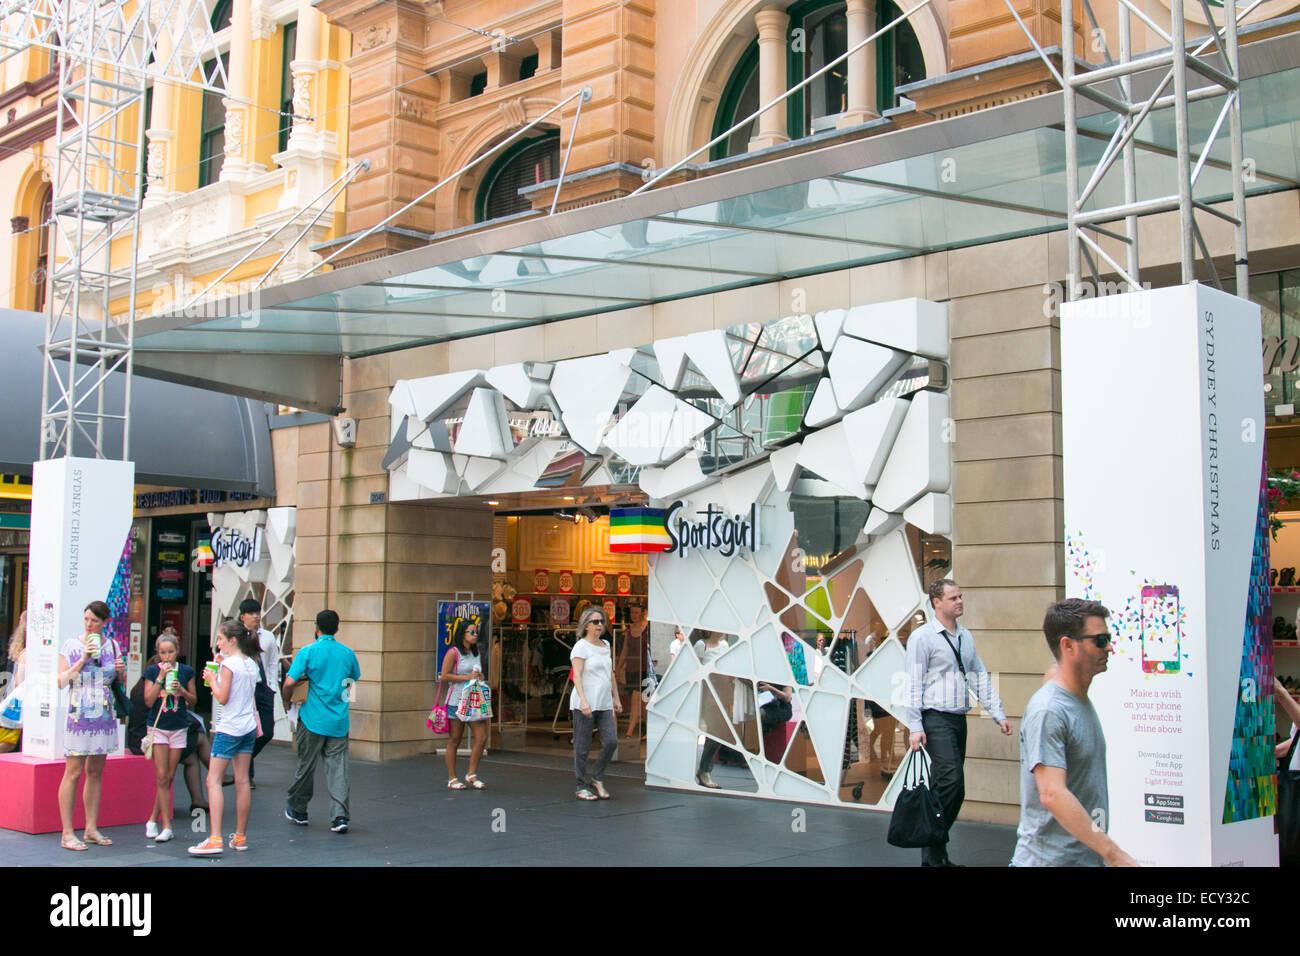 Sportsgirl Clothing Store Shop In Pitt Streetsydneyaustralia